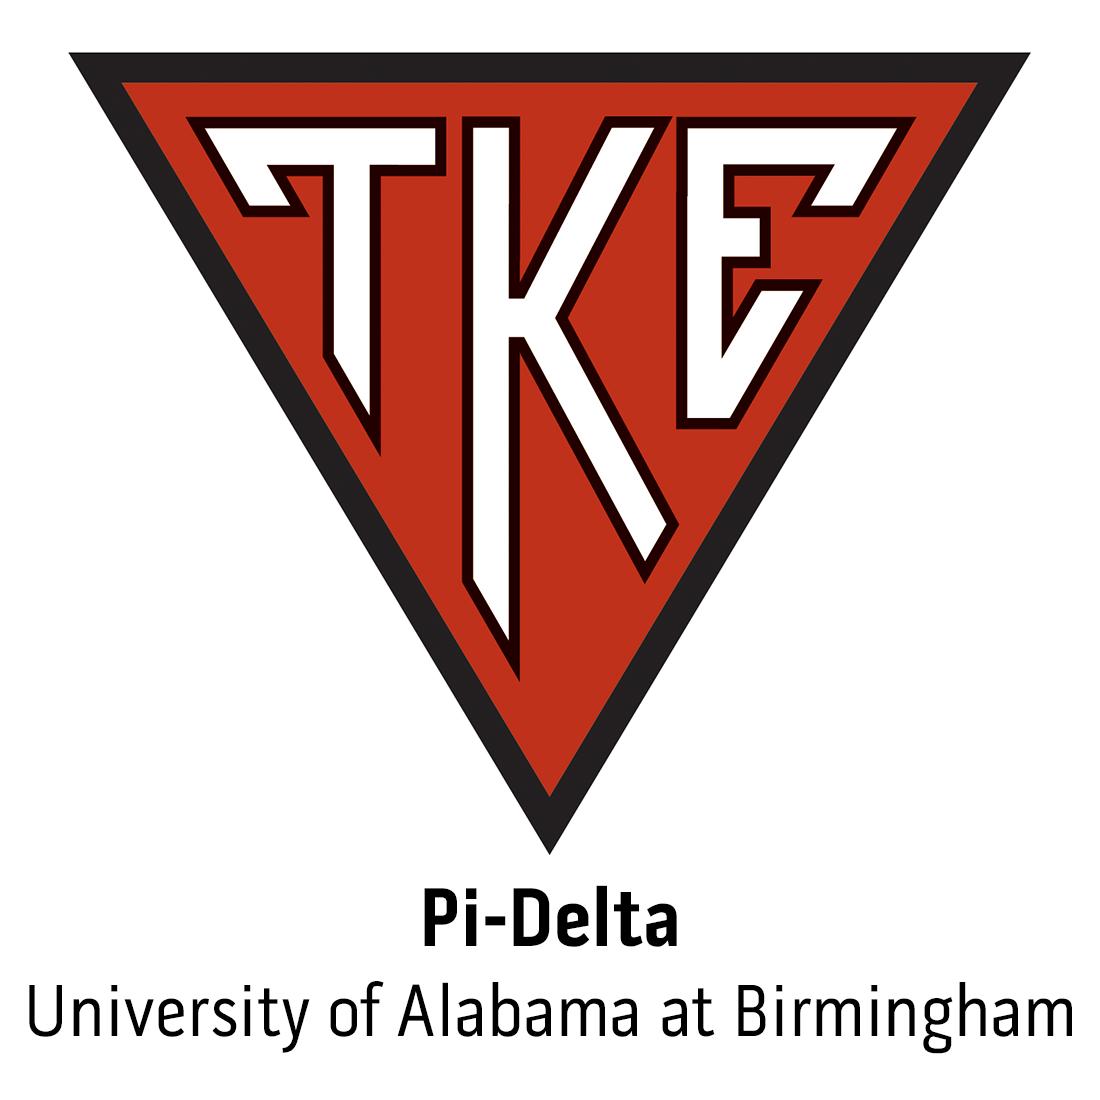 Pi-Delta Chapter at University of Alabama at Birmingham